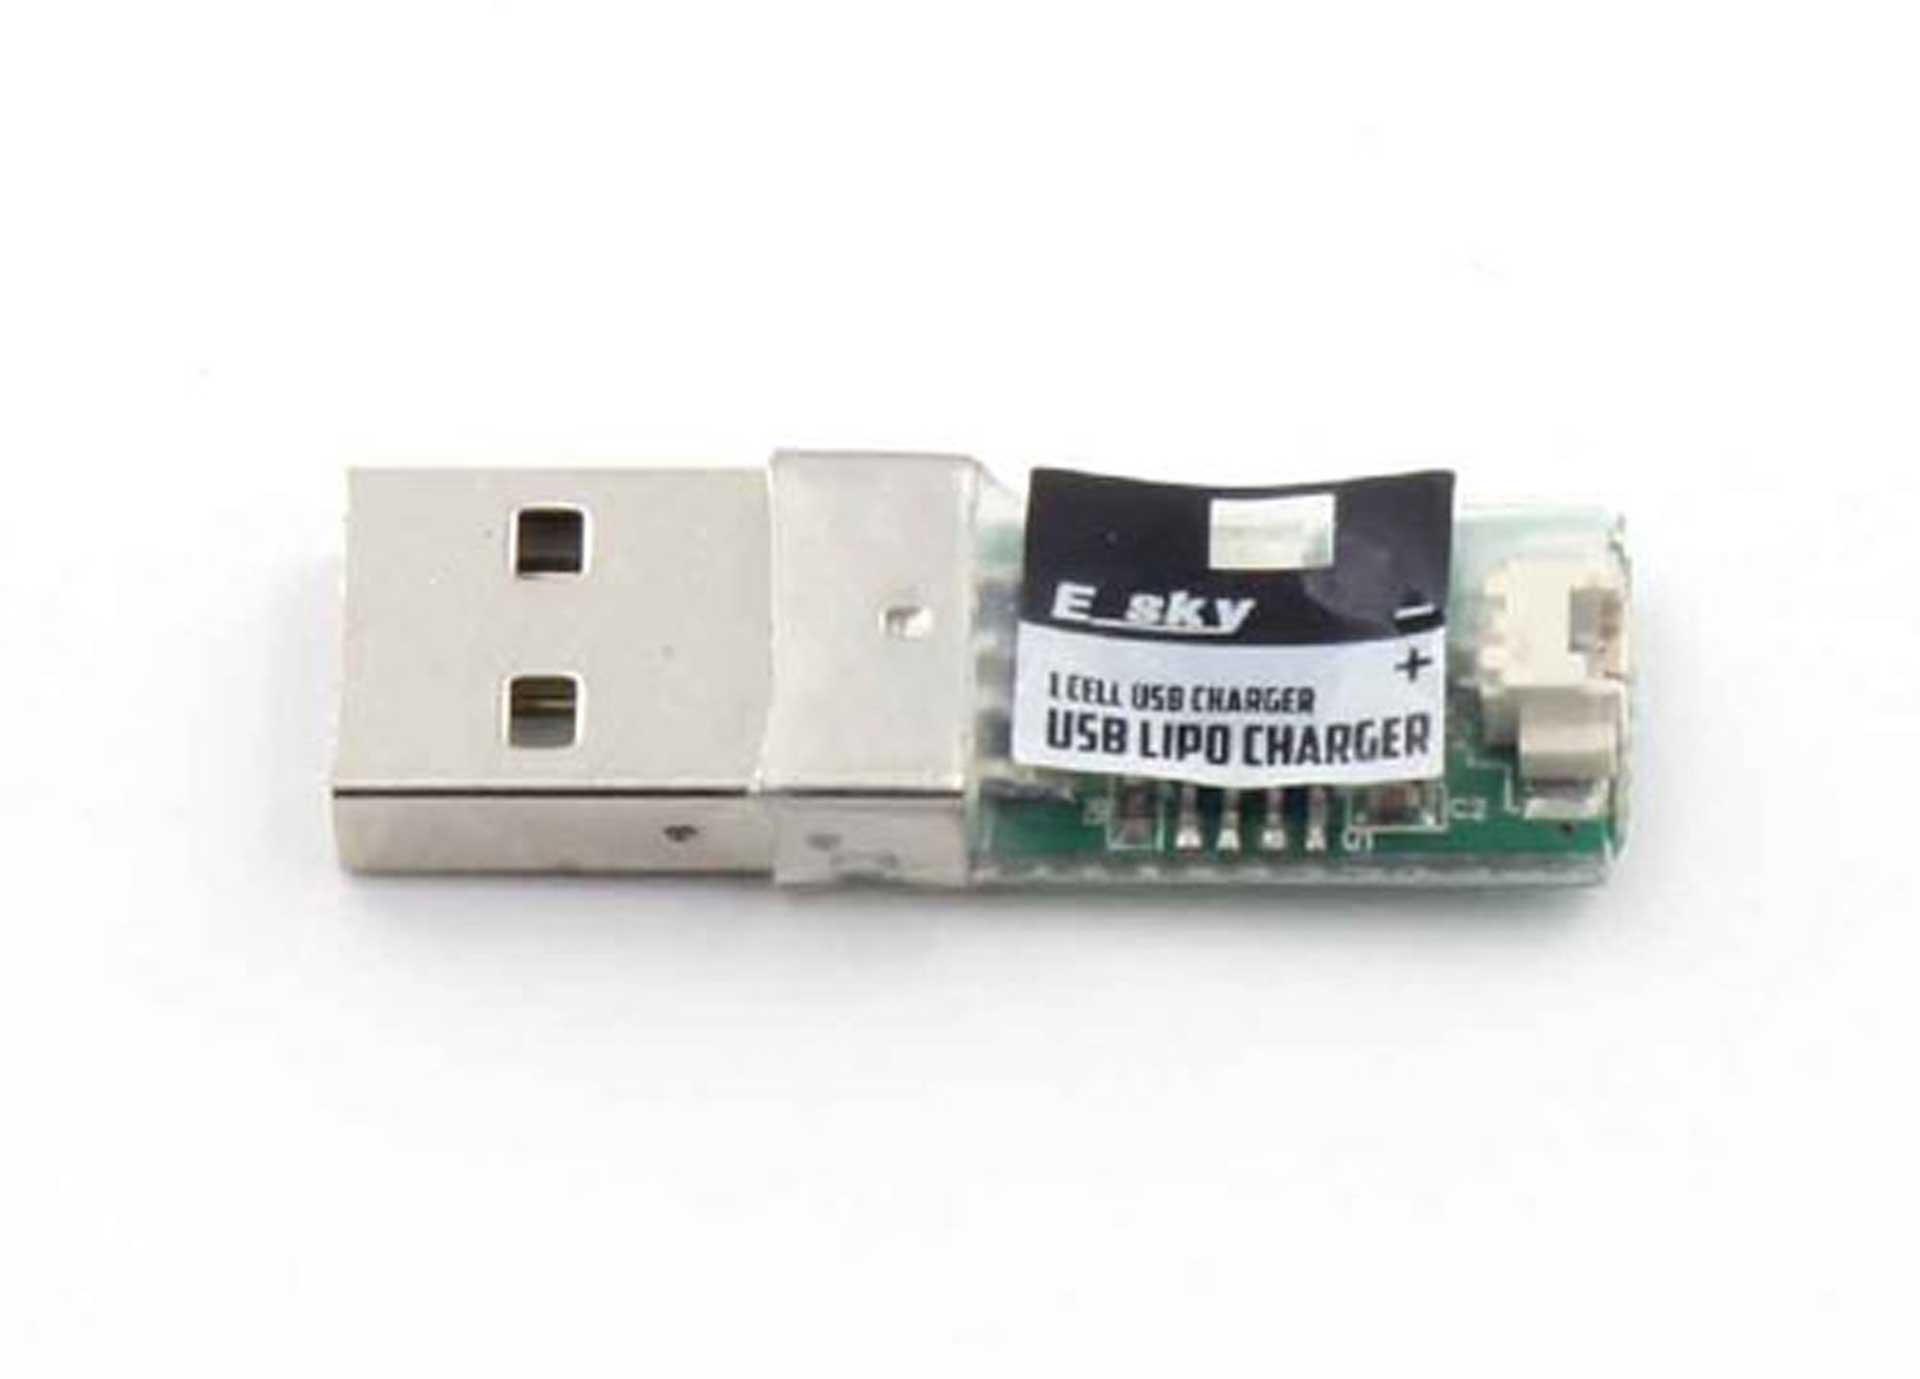 E-SKY USB LADEGERÄT F150 V2